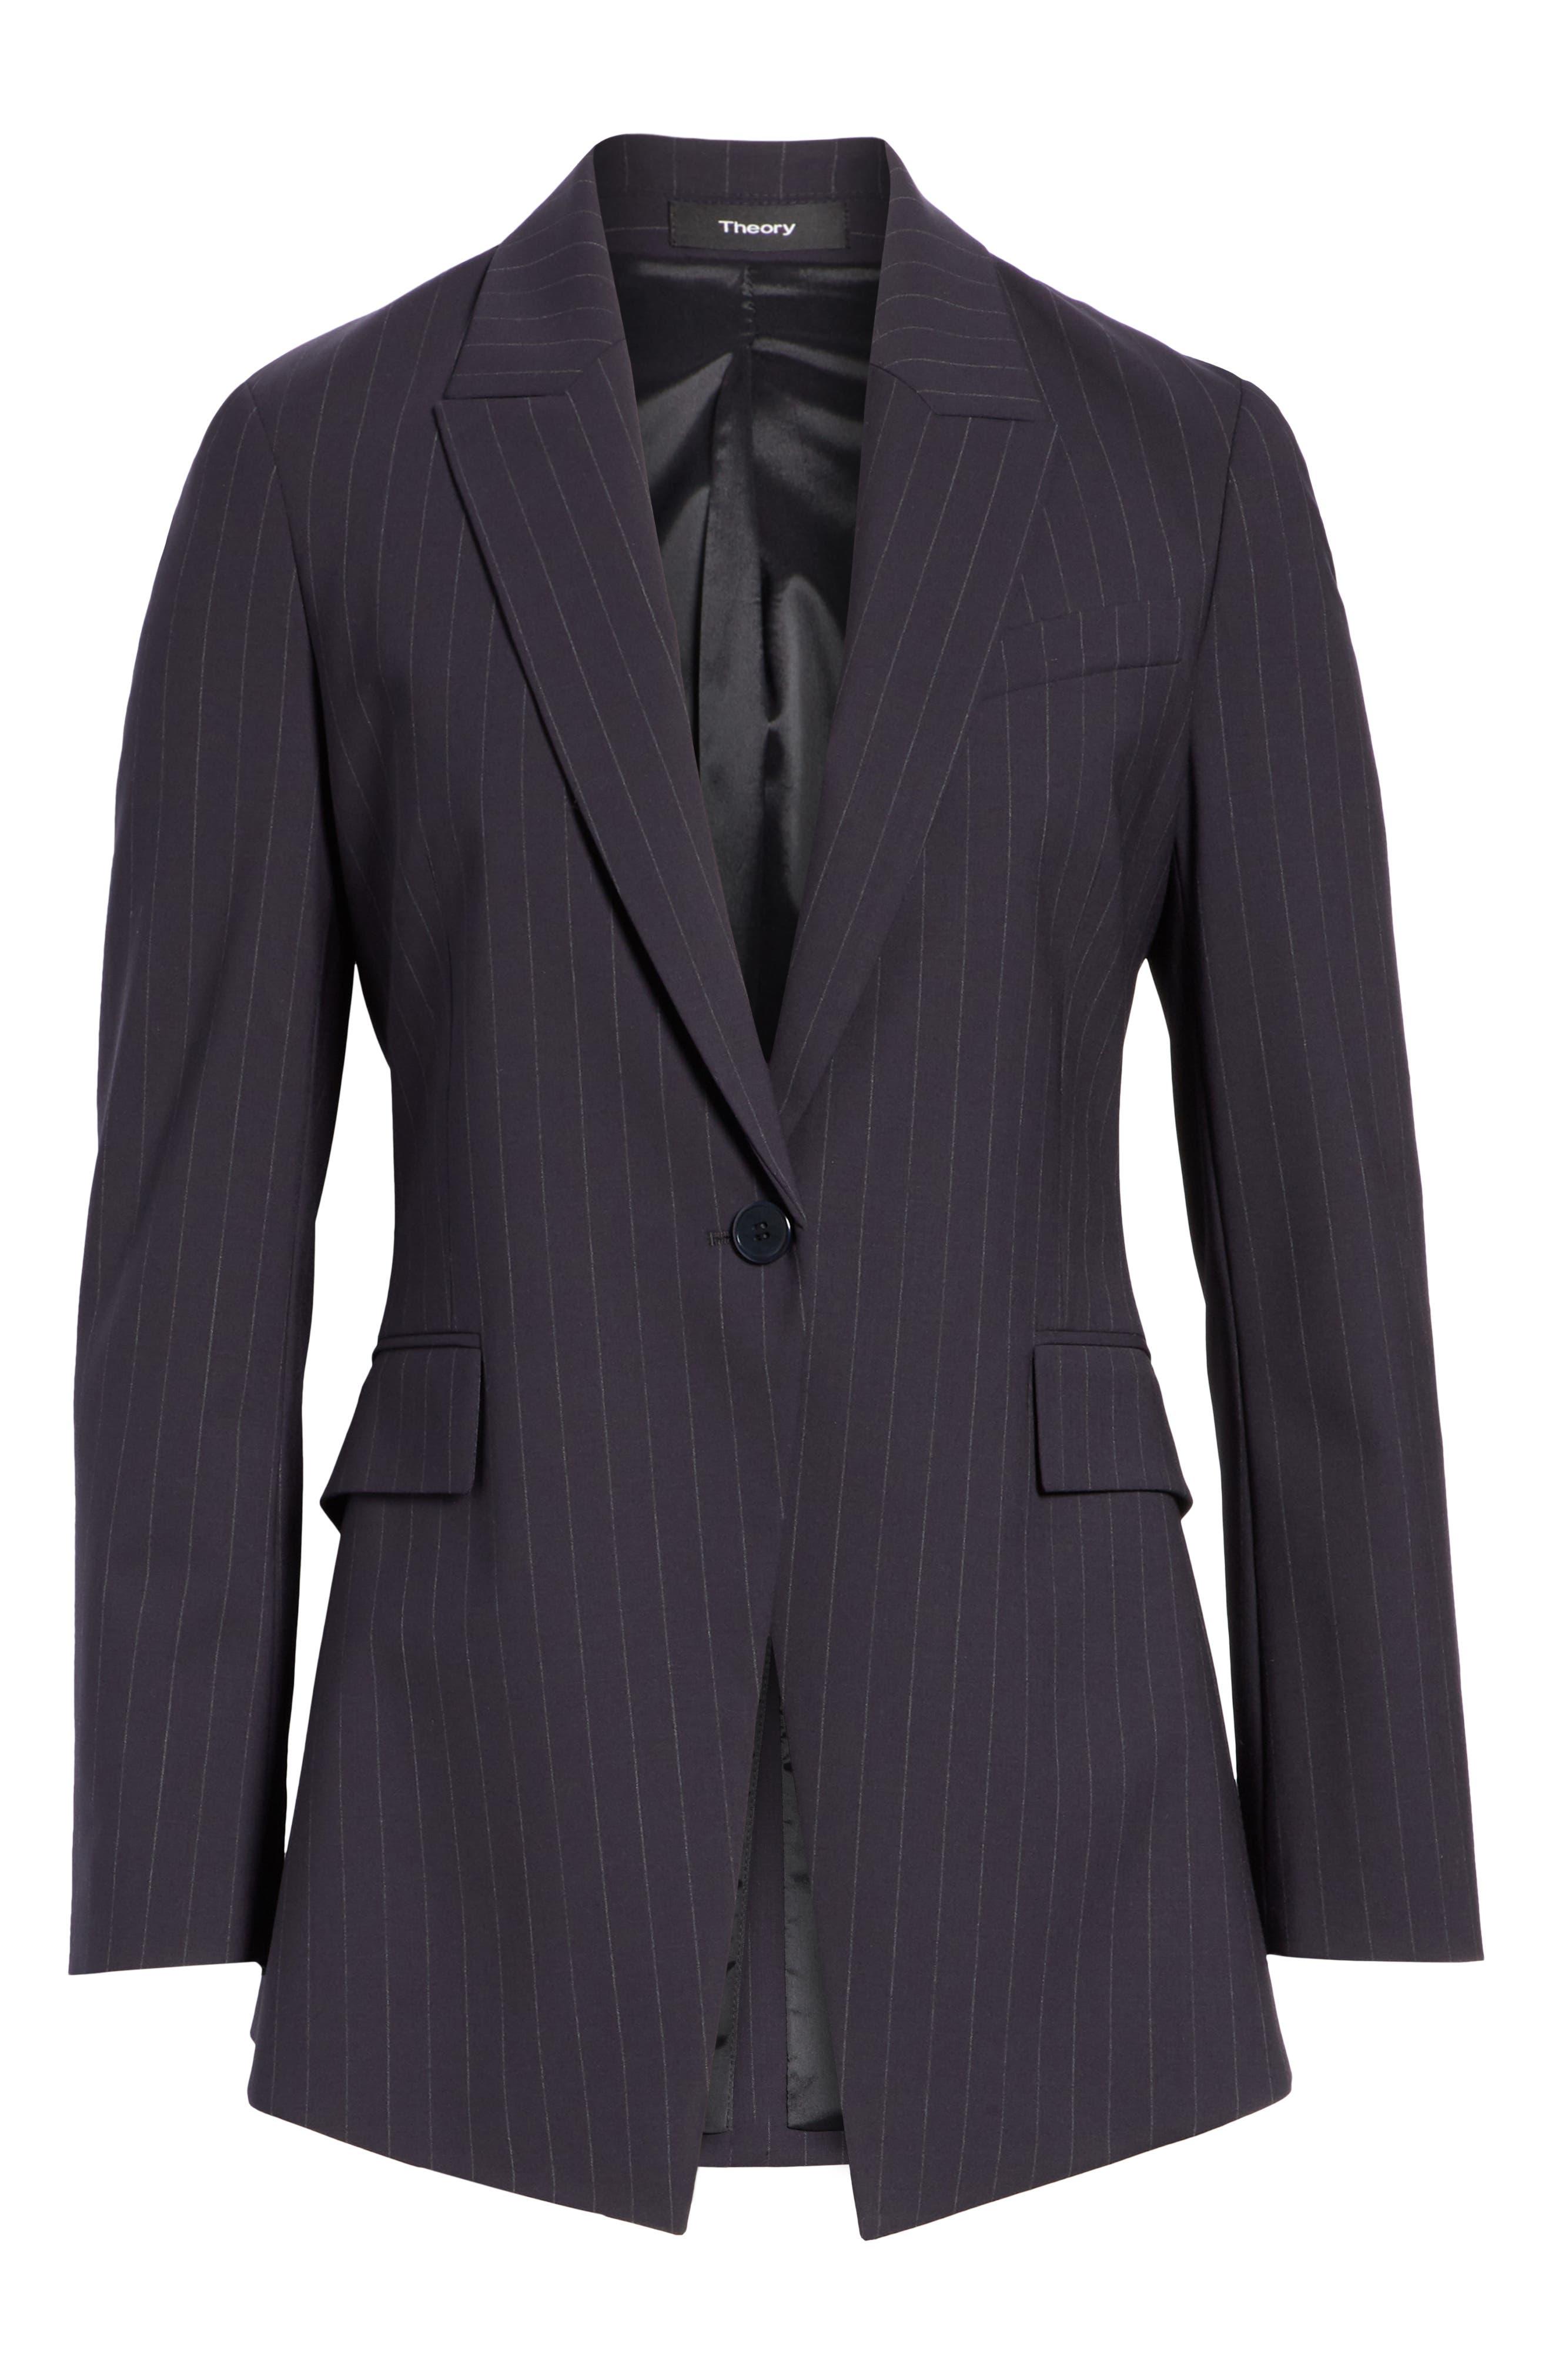 Etienette B Good Wool Suit Jacket,                             Alternate thumbnail 35, color,